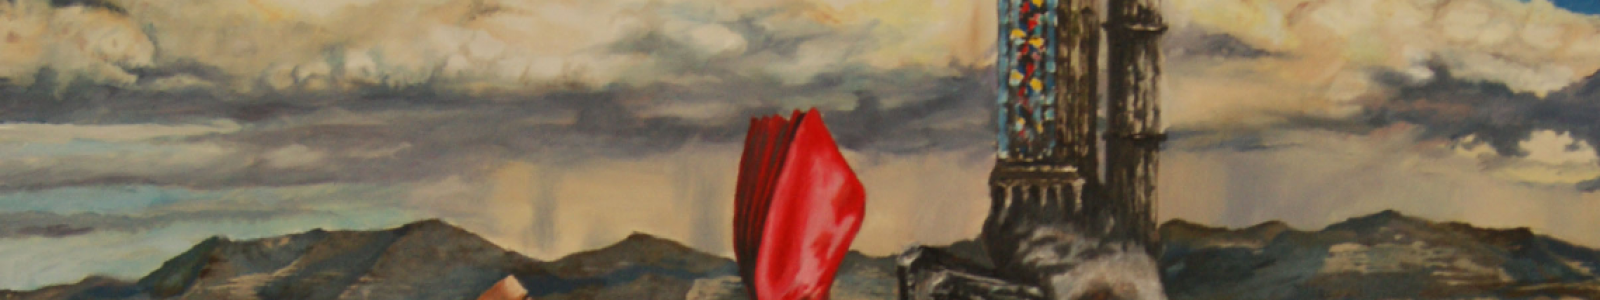 Gallery Painter sergey kirillov